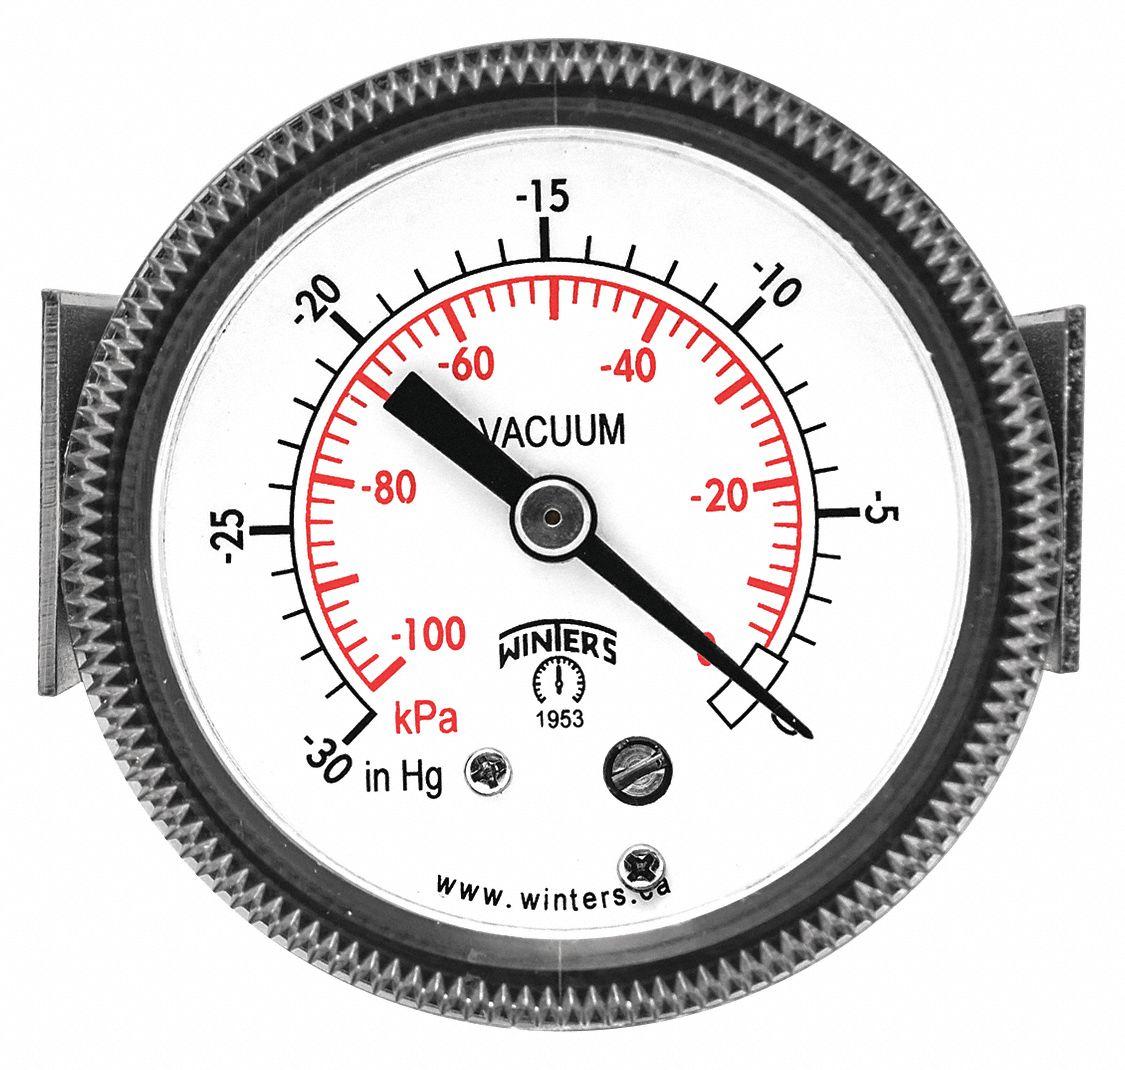 winters instruments 2 u0026quot  general purpose vacuum gauge  -30 to 0 in  hg - 491d49